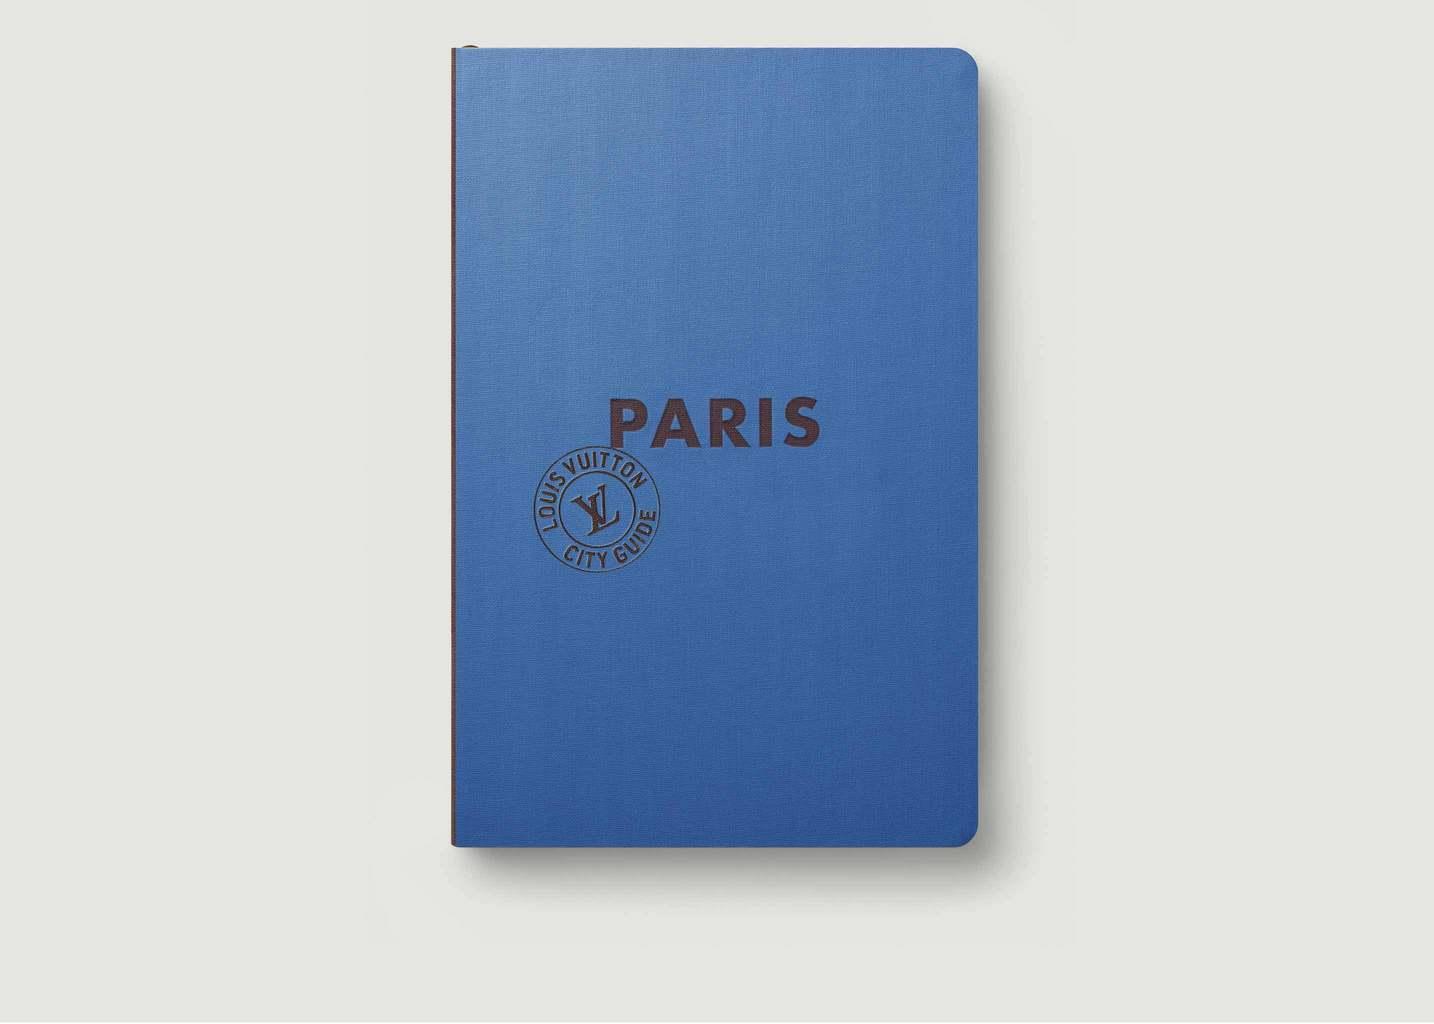 City Guide Paris 2020 (Anglais) - Louis Vuitton Travel Book